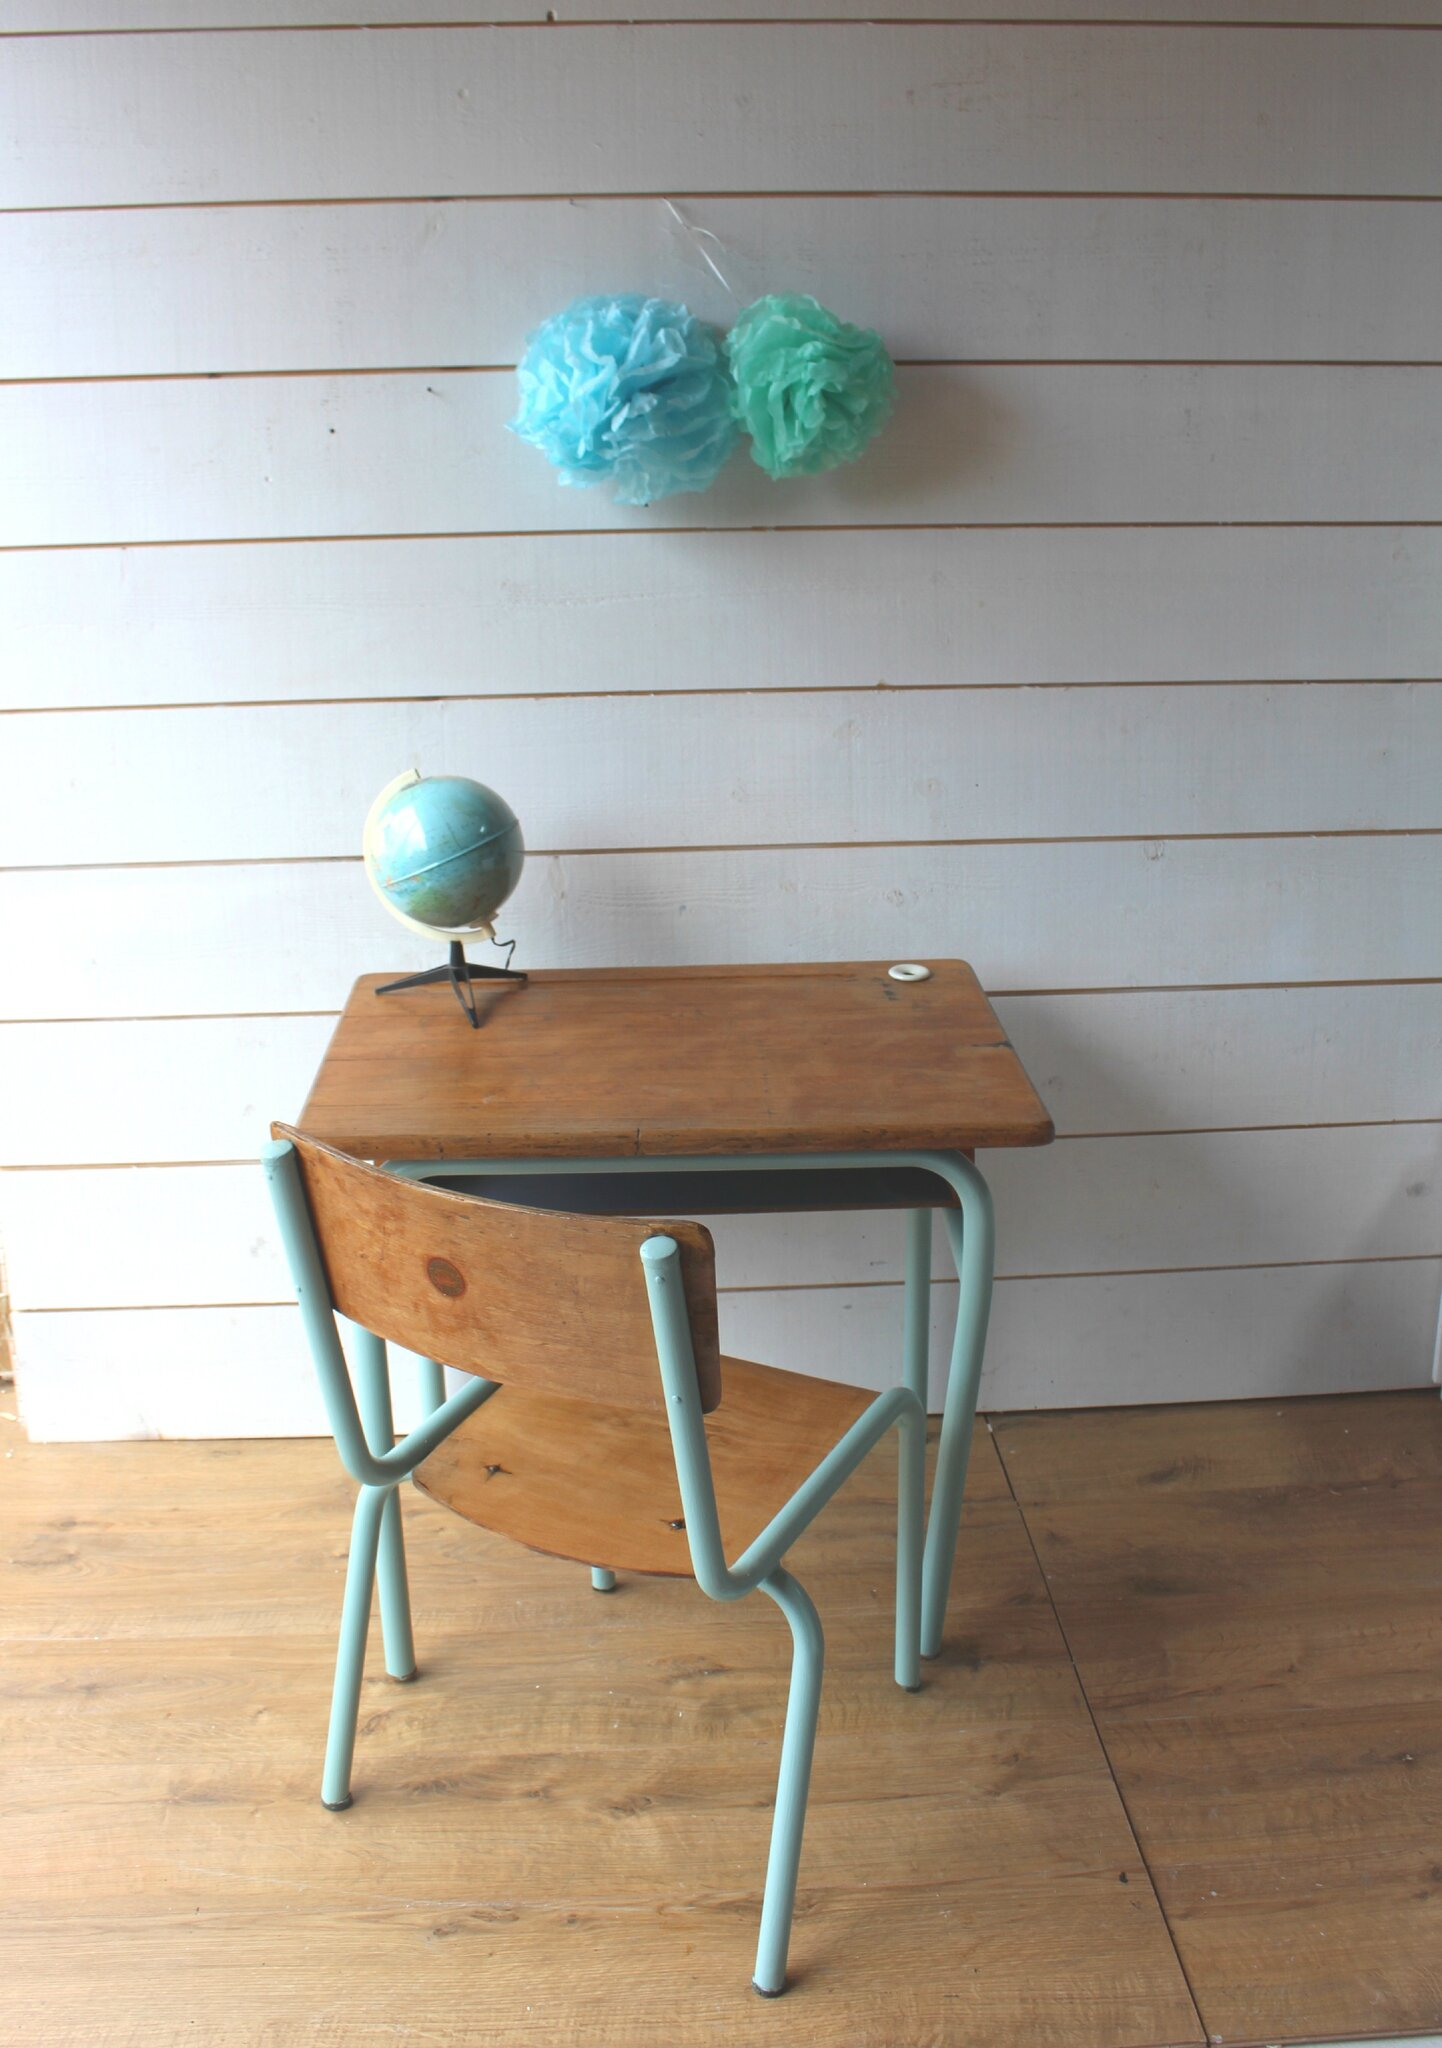 pupitre d 39 cole delagrave mobilier vintage pour enfants ribambelle compagnie. Black Bedroom Furniture Sets. Home Design Ideas